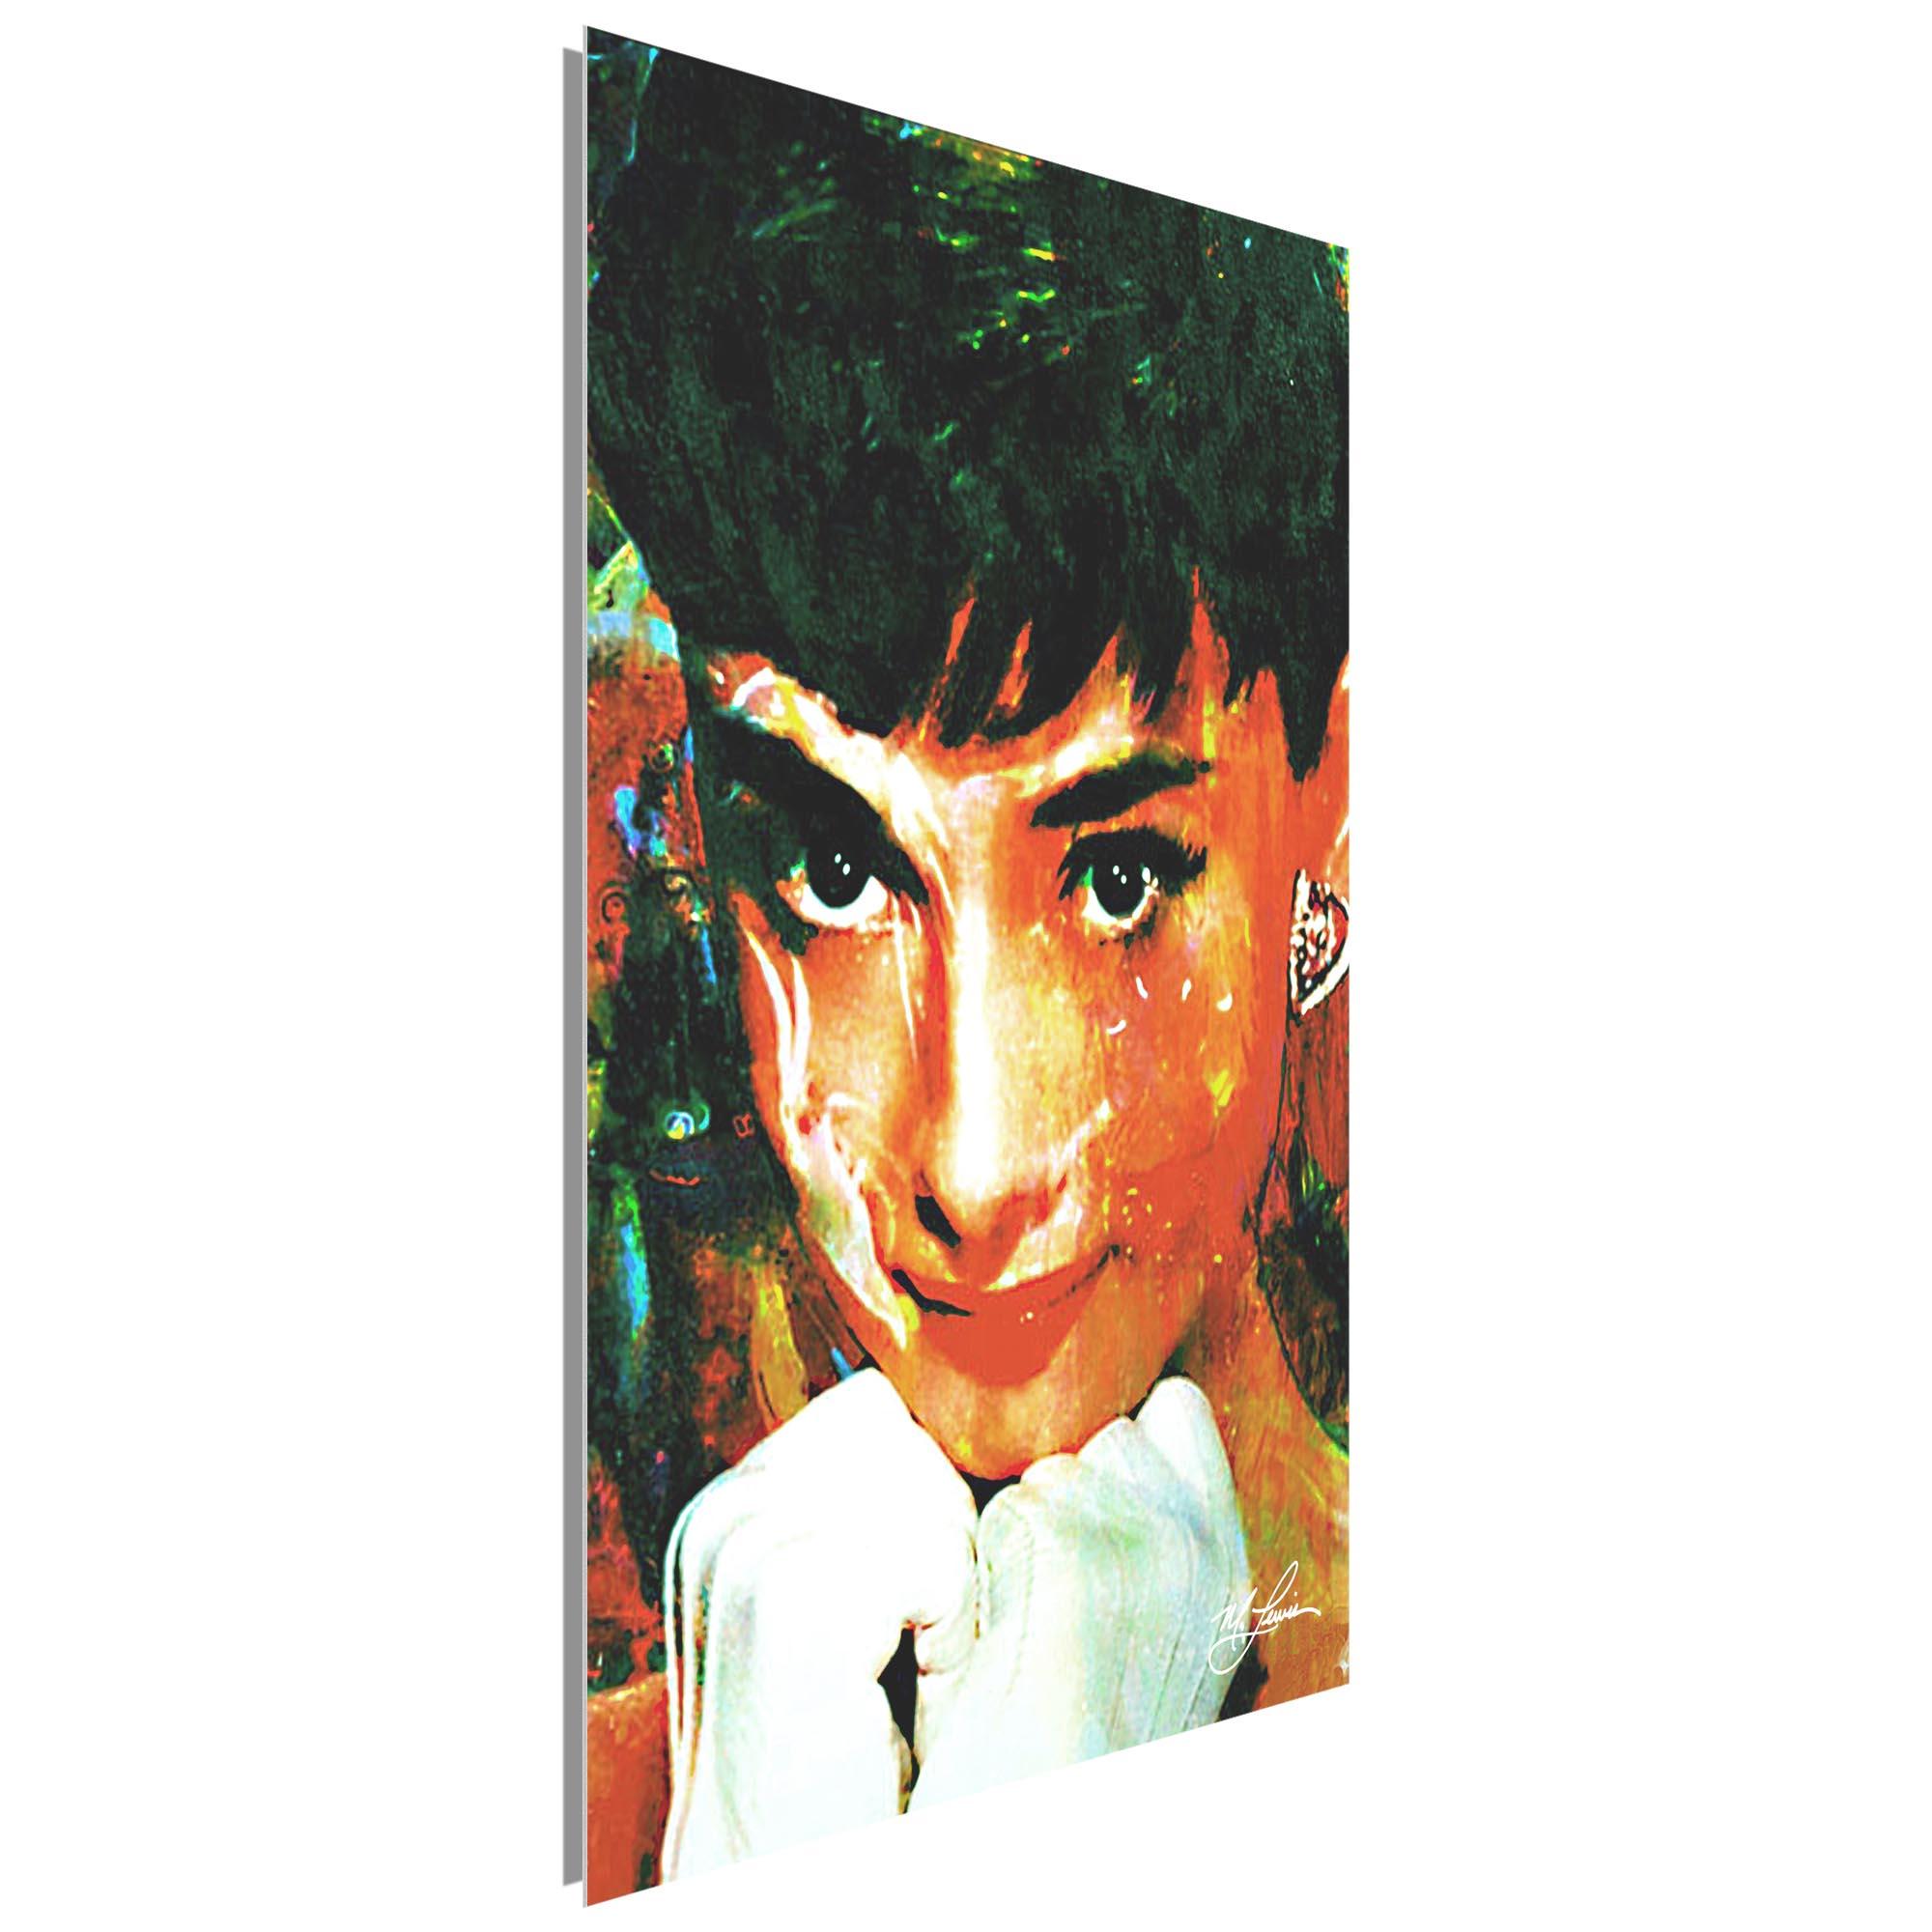 Audrey Hepburn Tiffany Delight 22x32 Metal or Plexiglass Pop Art Portrait - Image 2